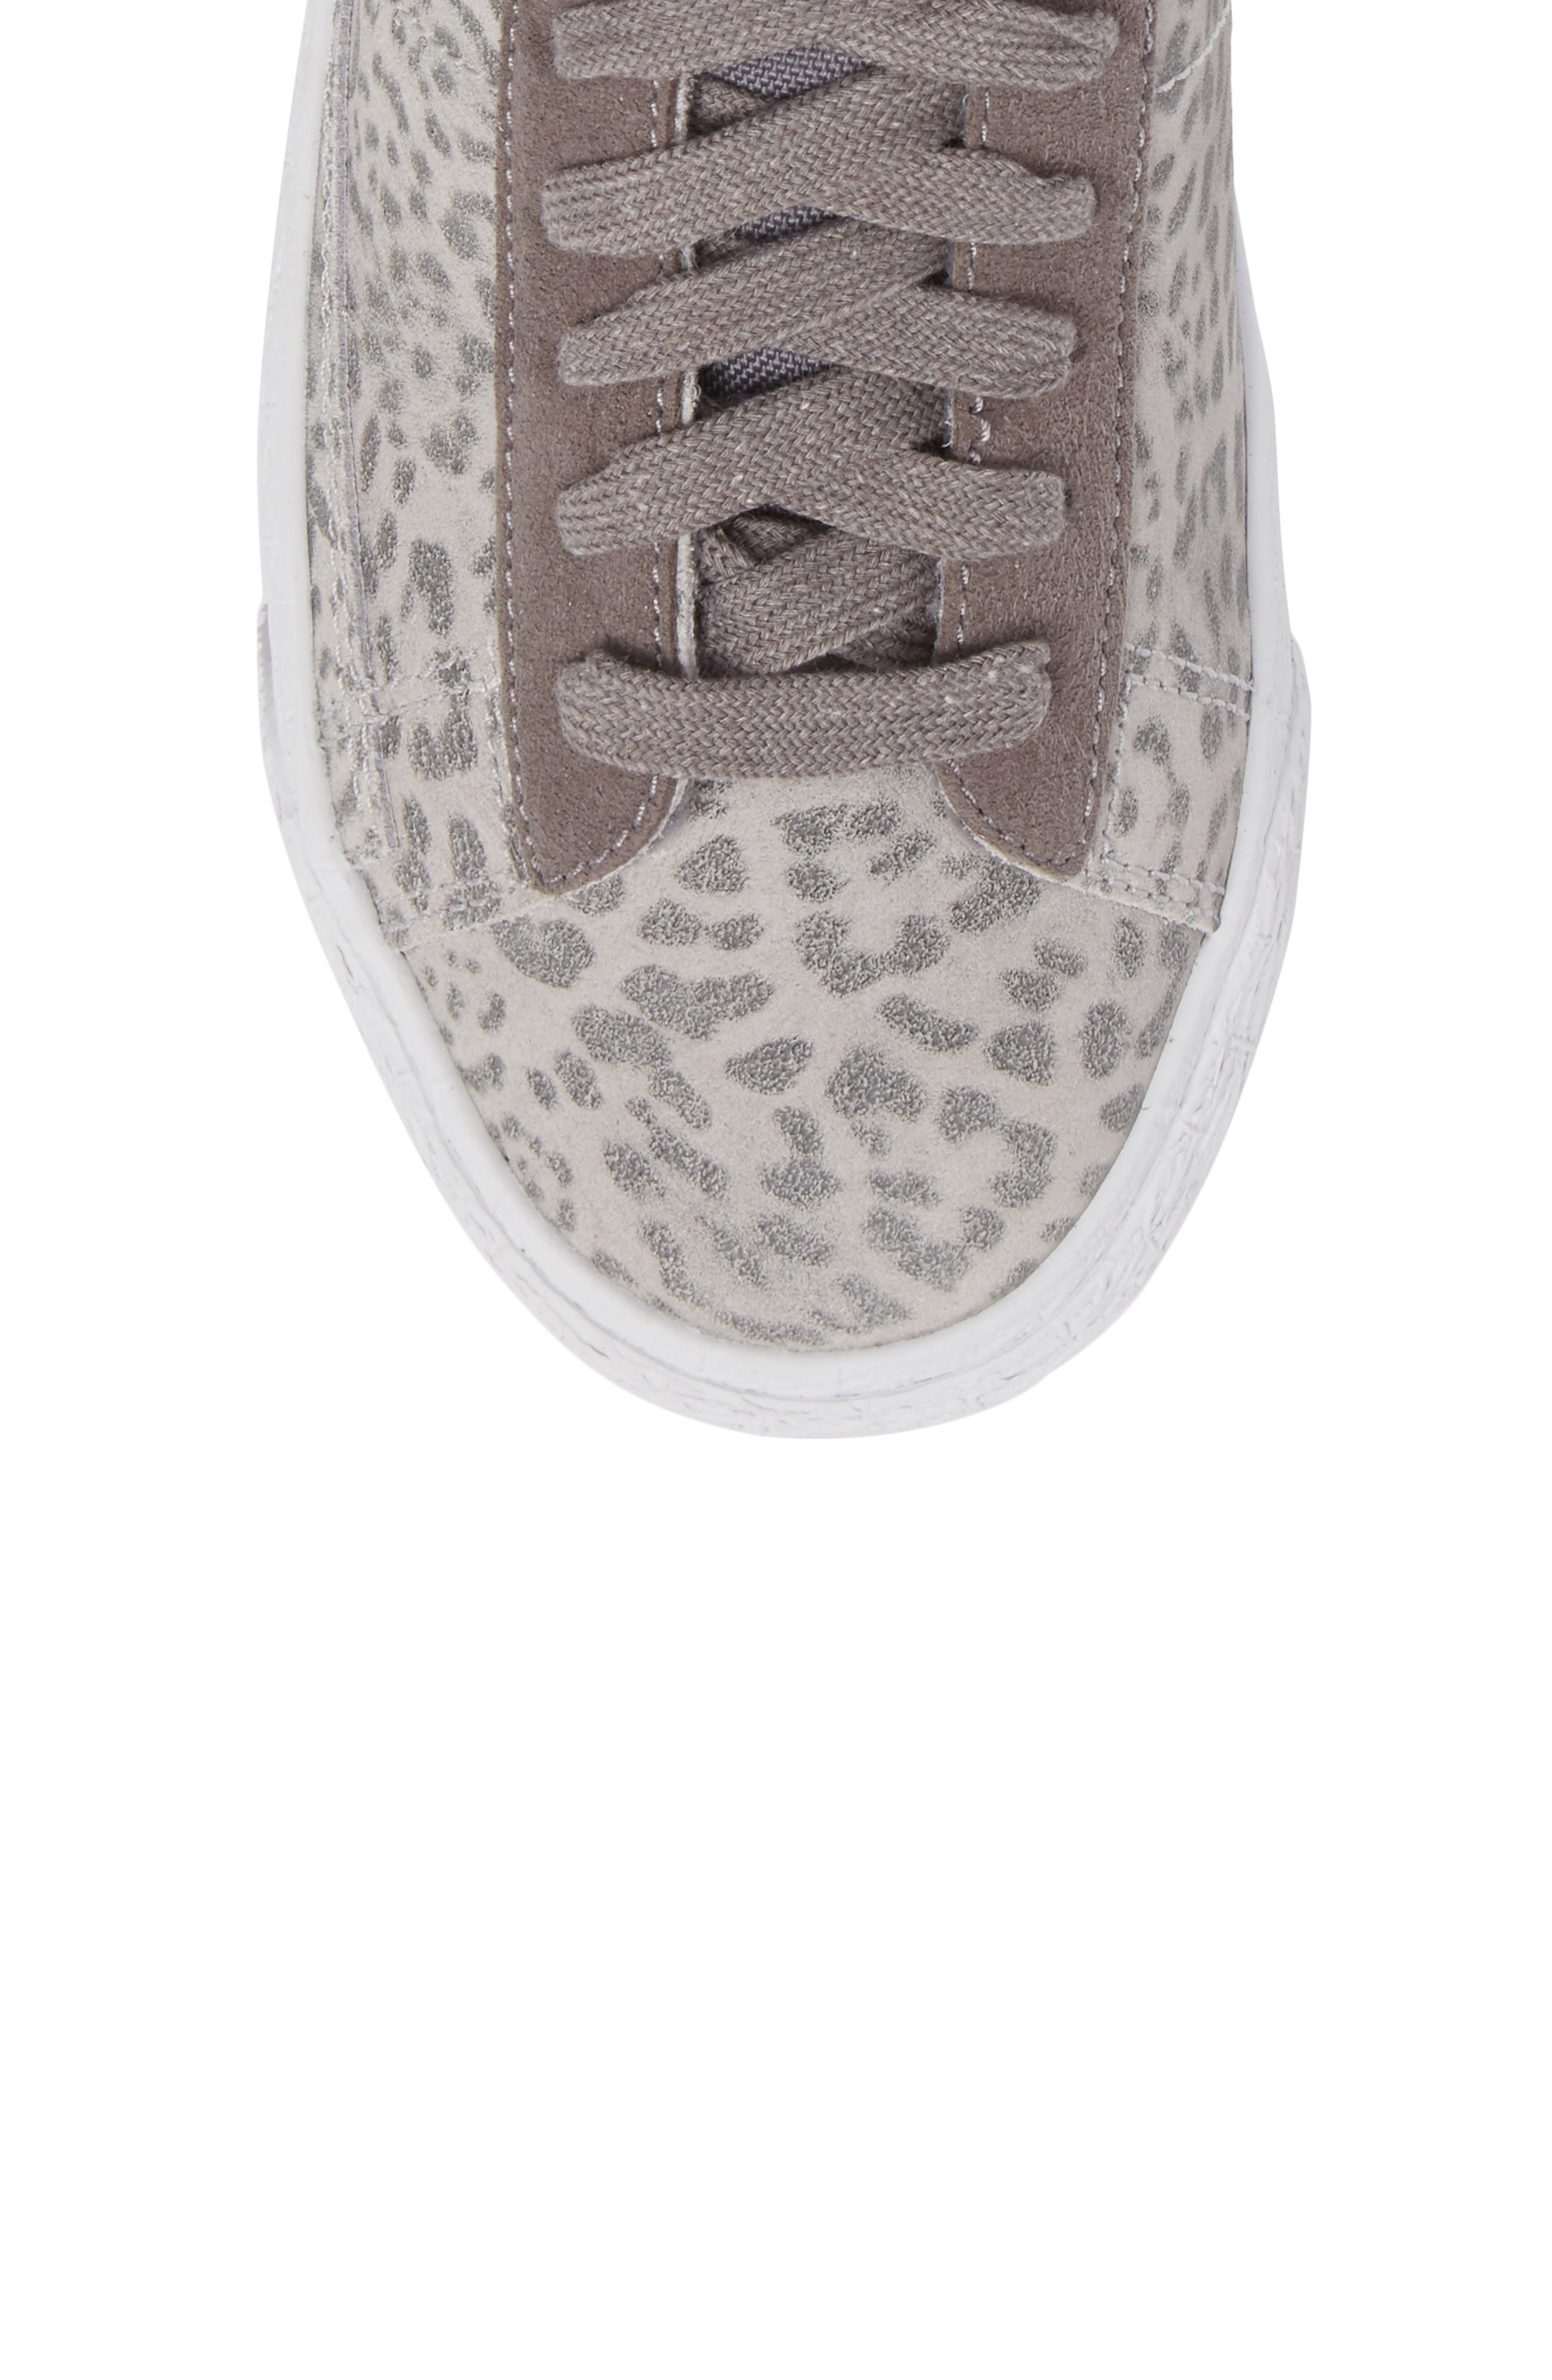 Blazer Mid SE High Top Sneaker,                             Alternate thumbnail 4, color,                             Atmosphere Grey/ Smoke/ Gum